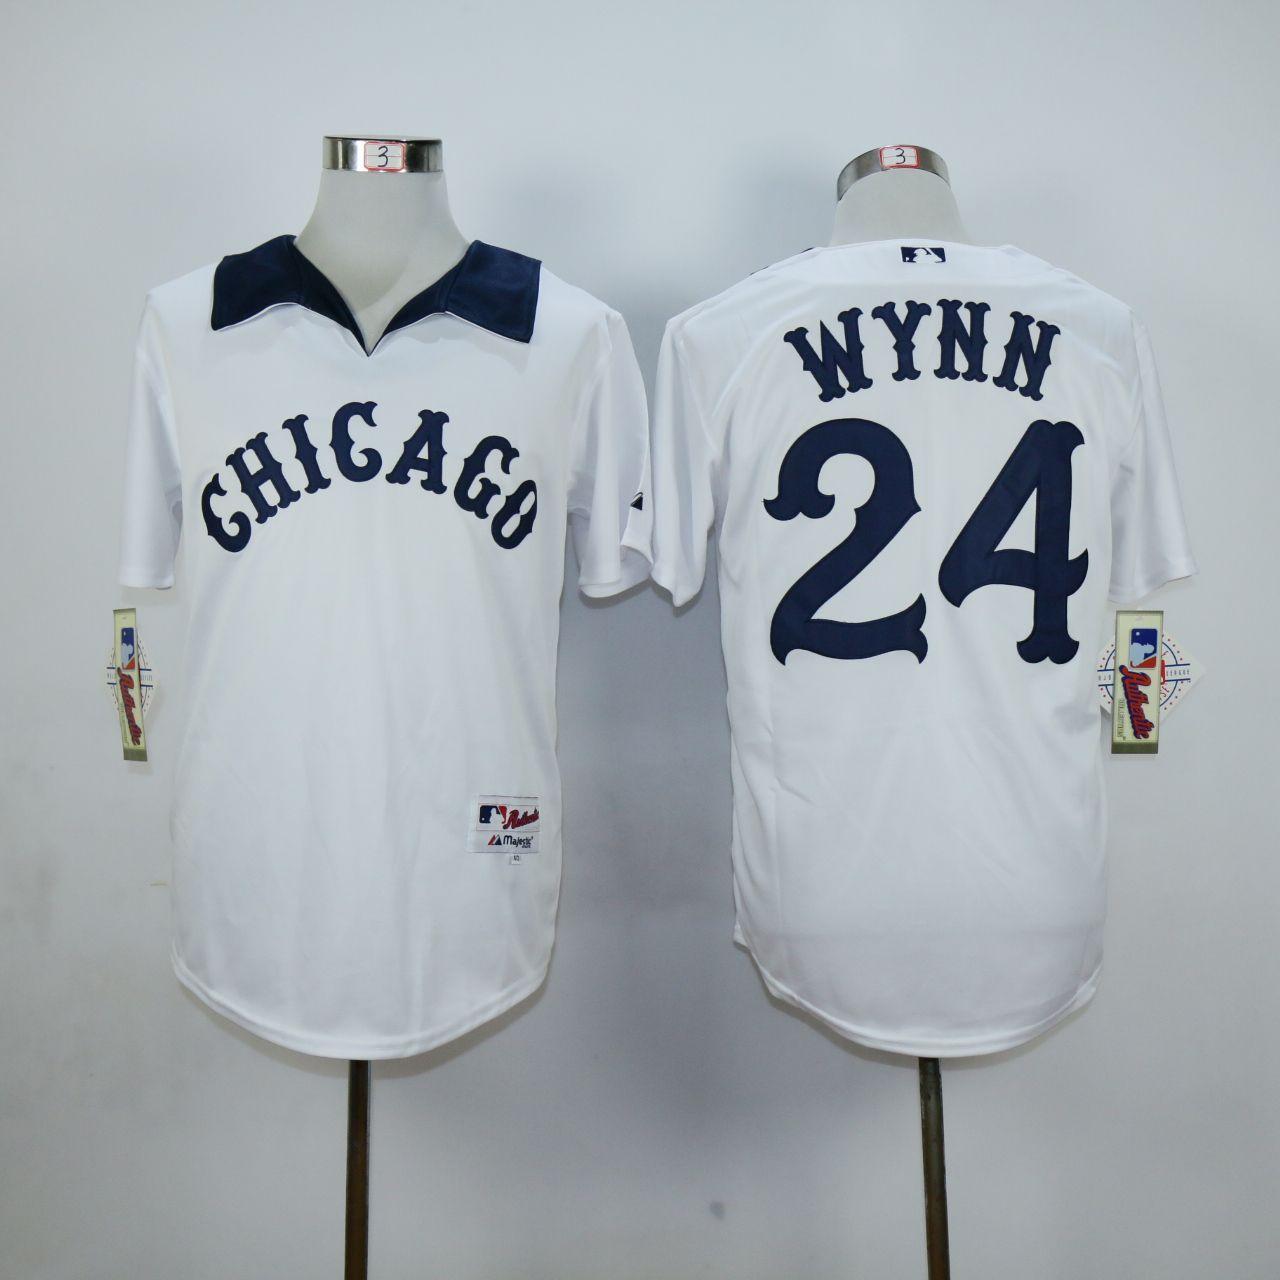 MLB Chicago White Sox 24 Wynn White Jersey,cheap mlb jerseys,cheap ...